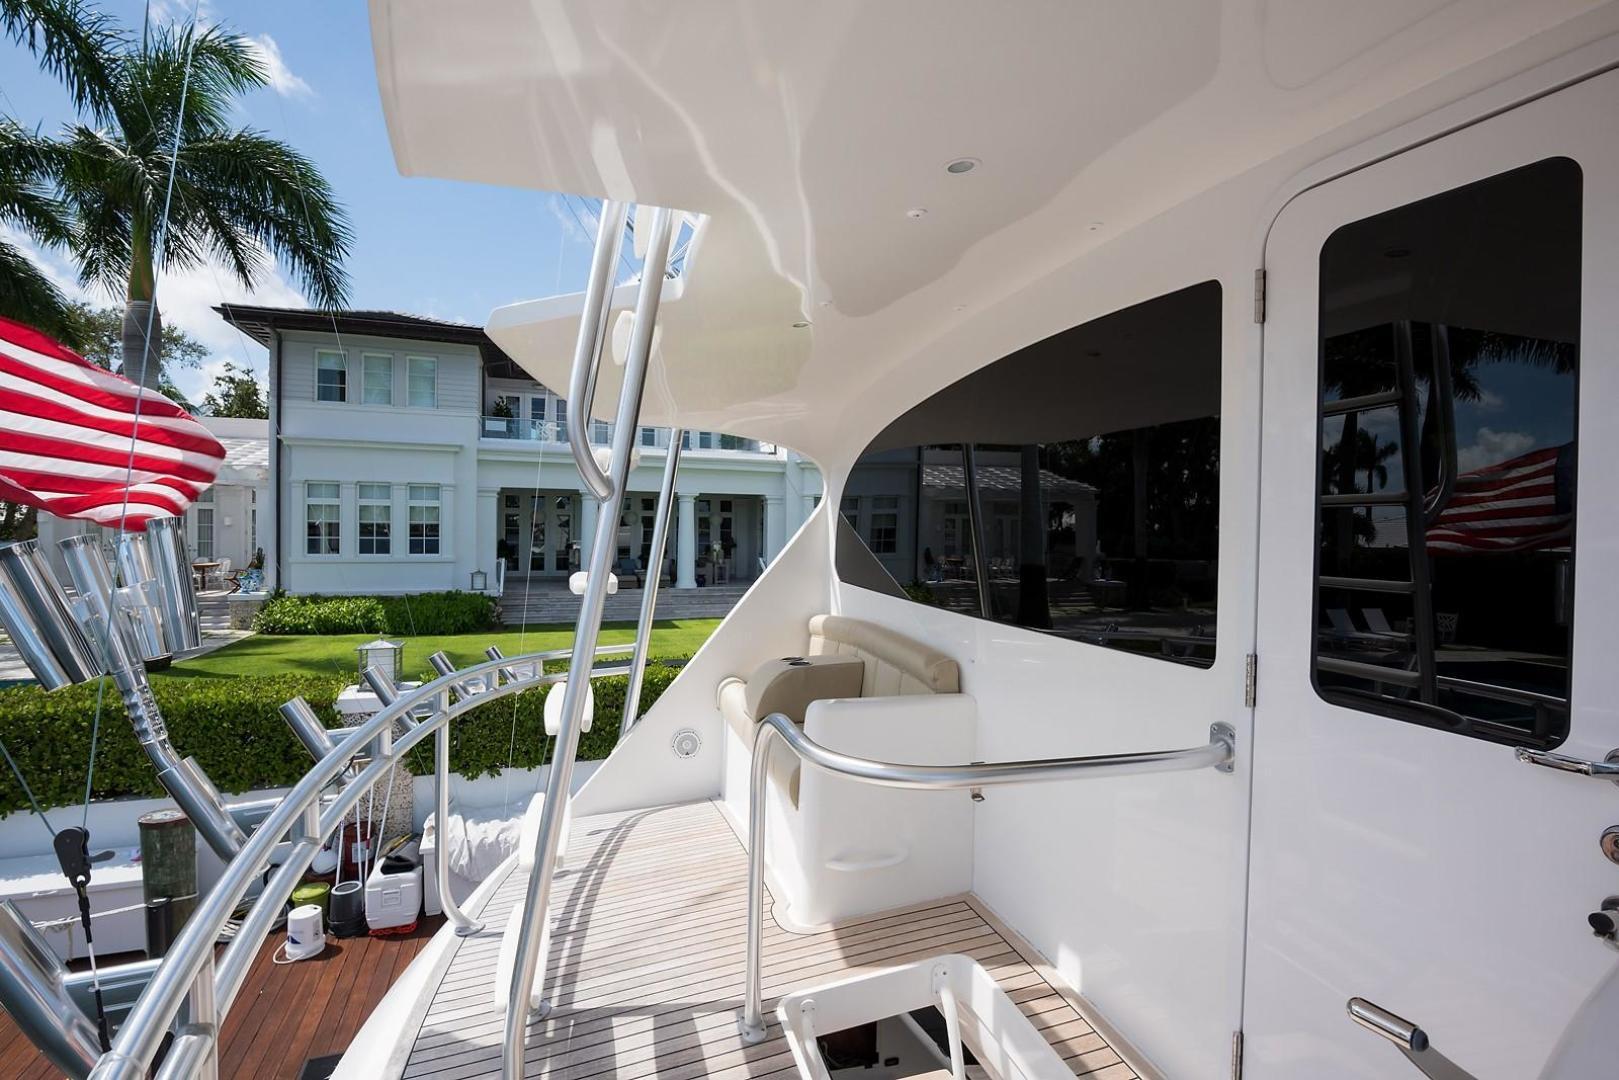 Viking-Enclosed 2013-No Name 82 Miami-Florida-United States-Enclosed Flybridge Aft Deck-1324720 | Thumbnail